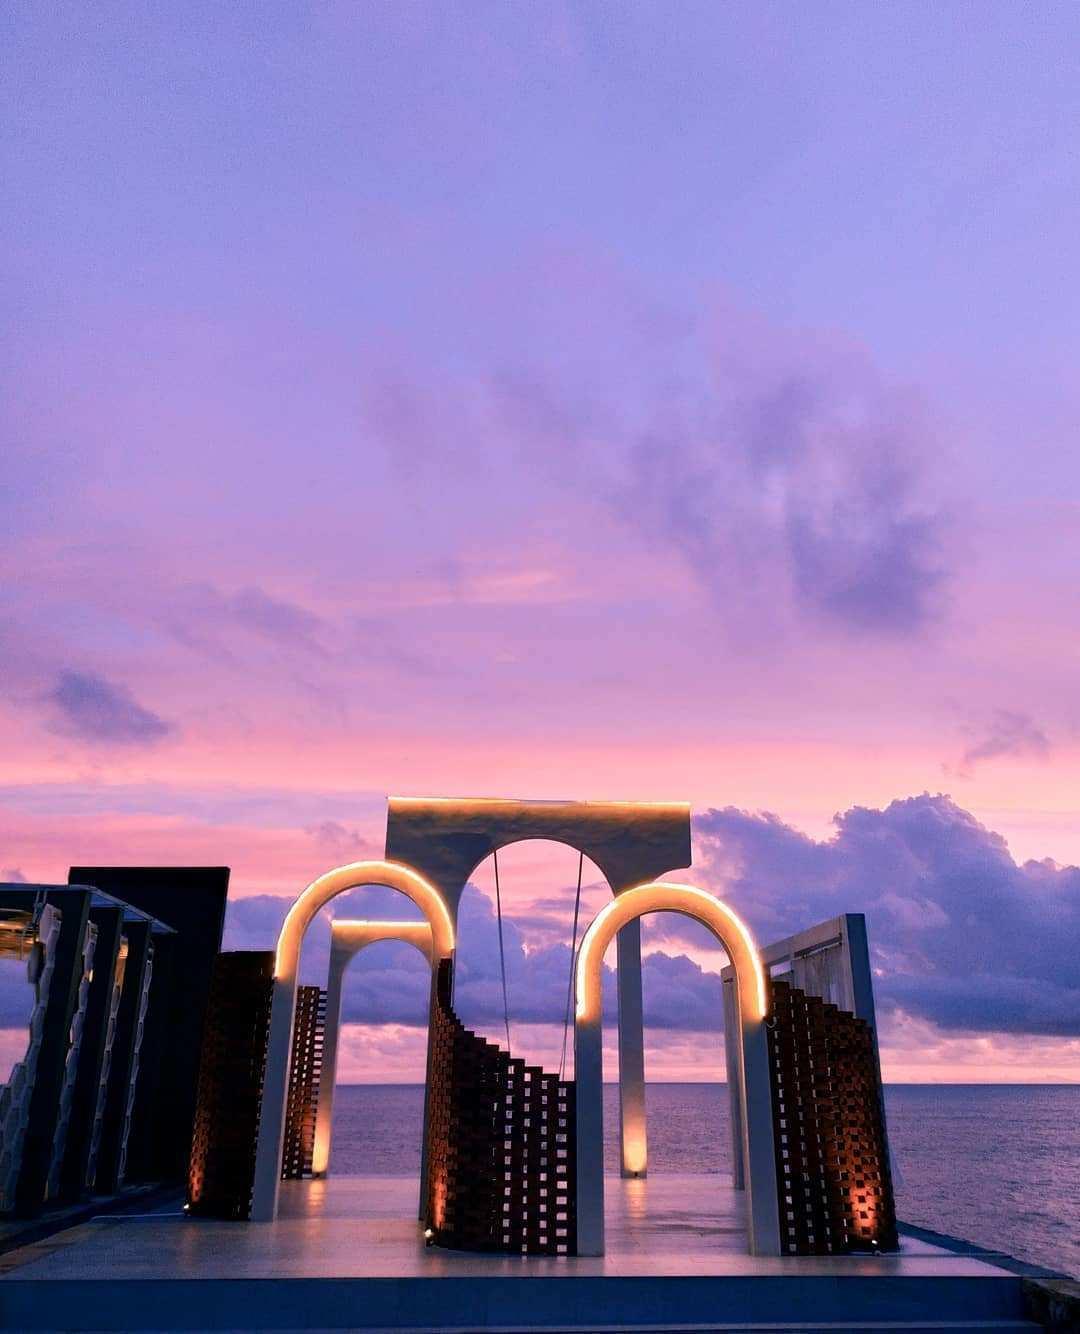 Spot Foto Pinggir Pantai di HeHa Ocean View Jogja Image From @hafis_irfan_r